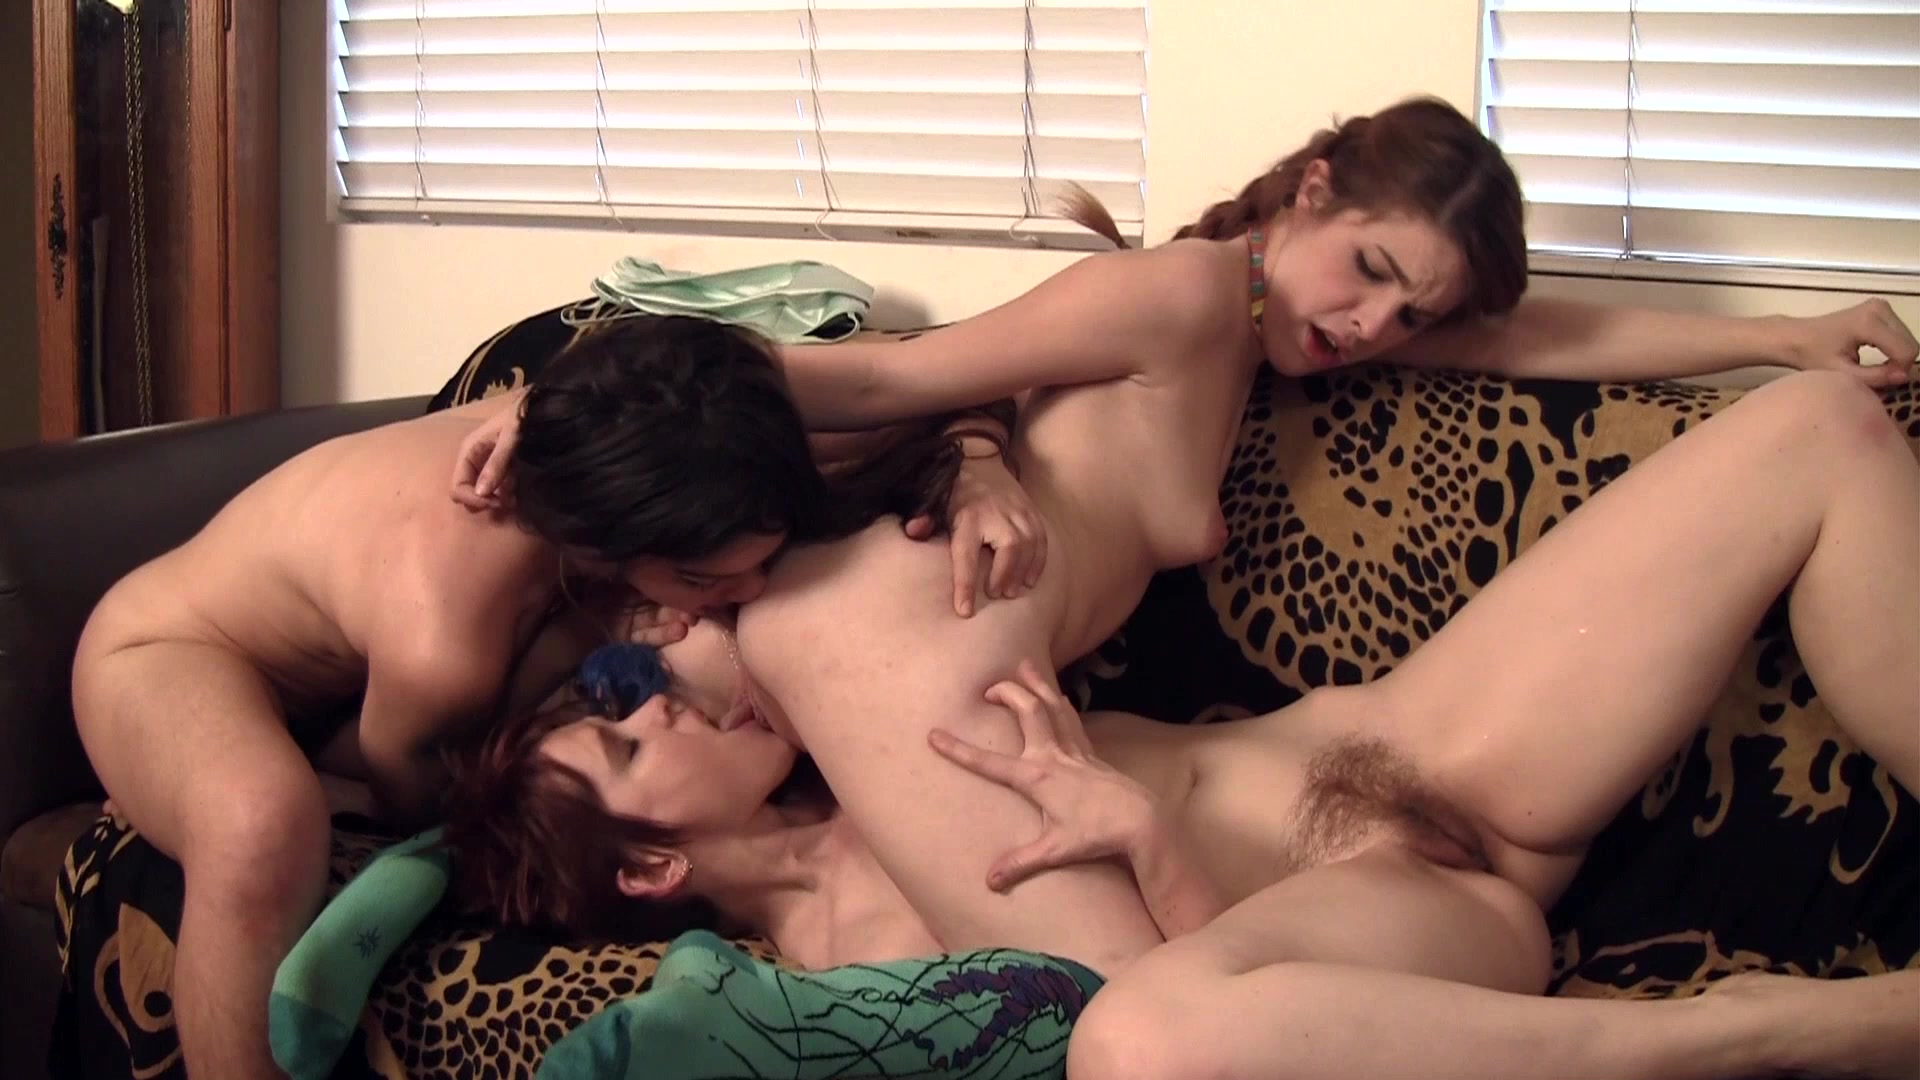 Tereza pantyhose playtime